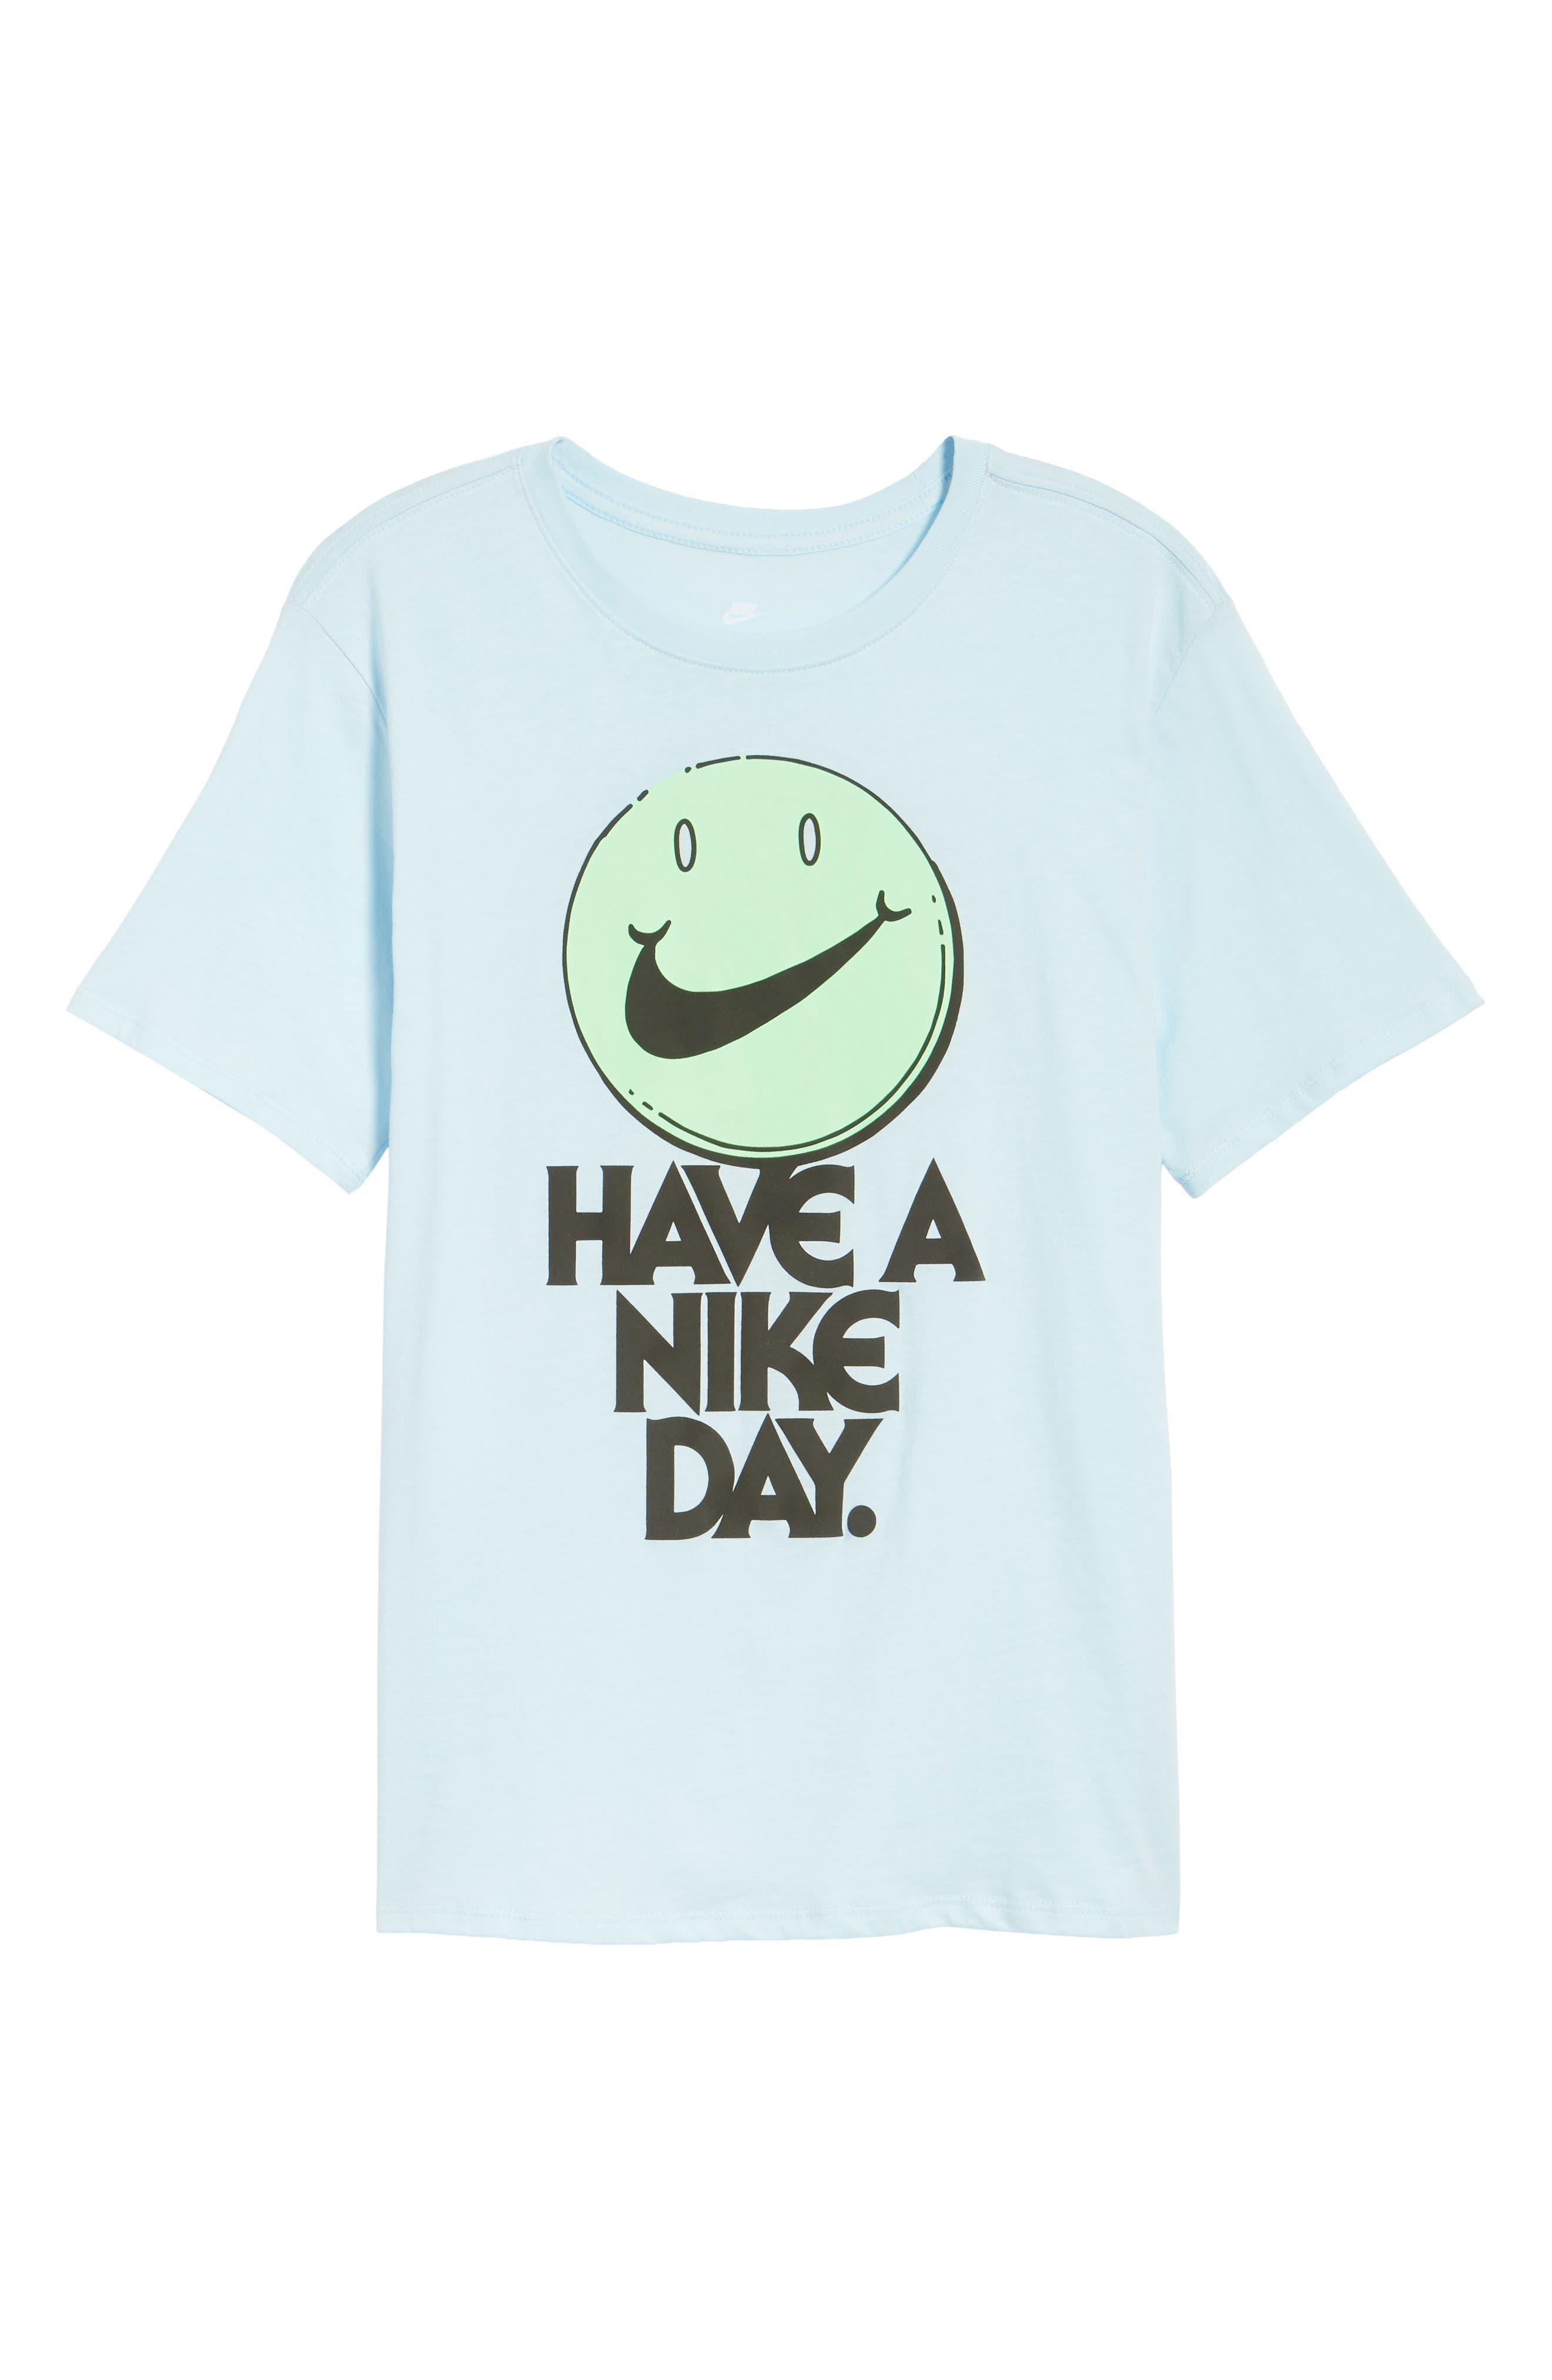 Concept Graphic T-Shirt,                             Alternate thumbnail 6, color,                             Cobalt Tint/ Illusion Green